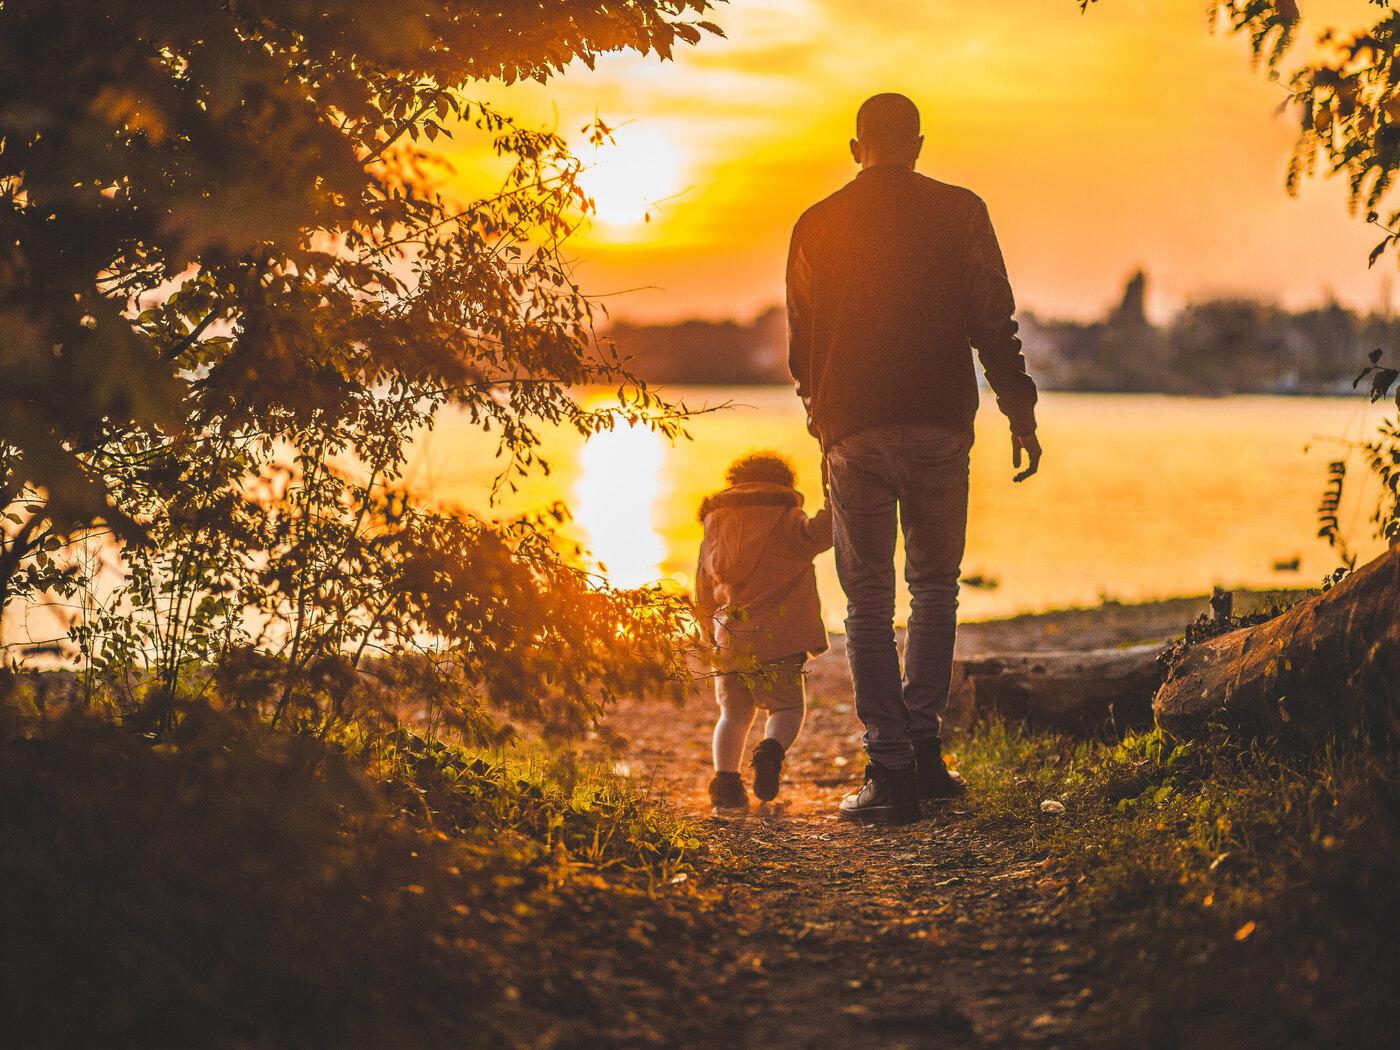 father-and-kid-walking-towards-lake-3o.jpg